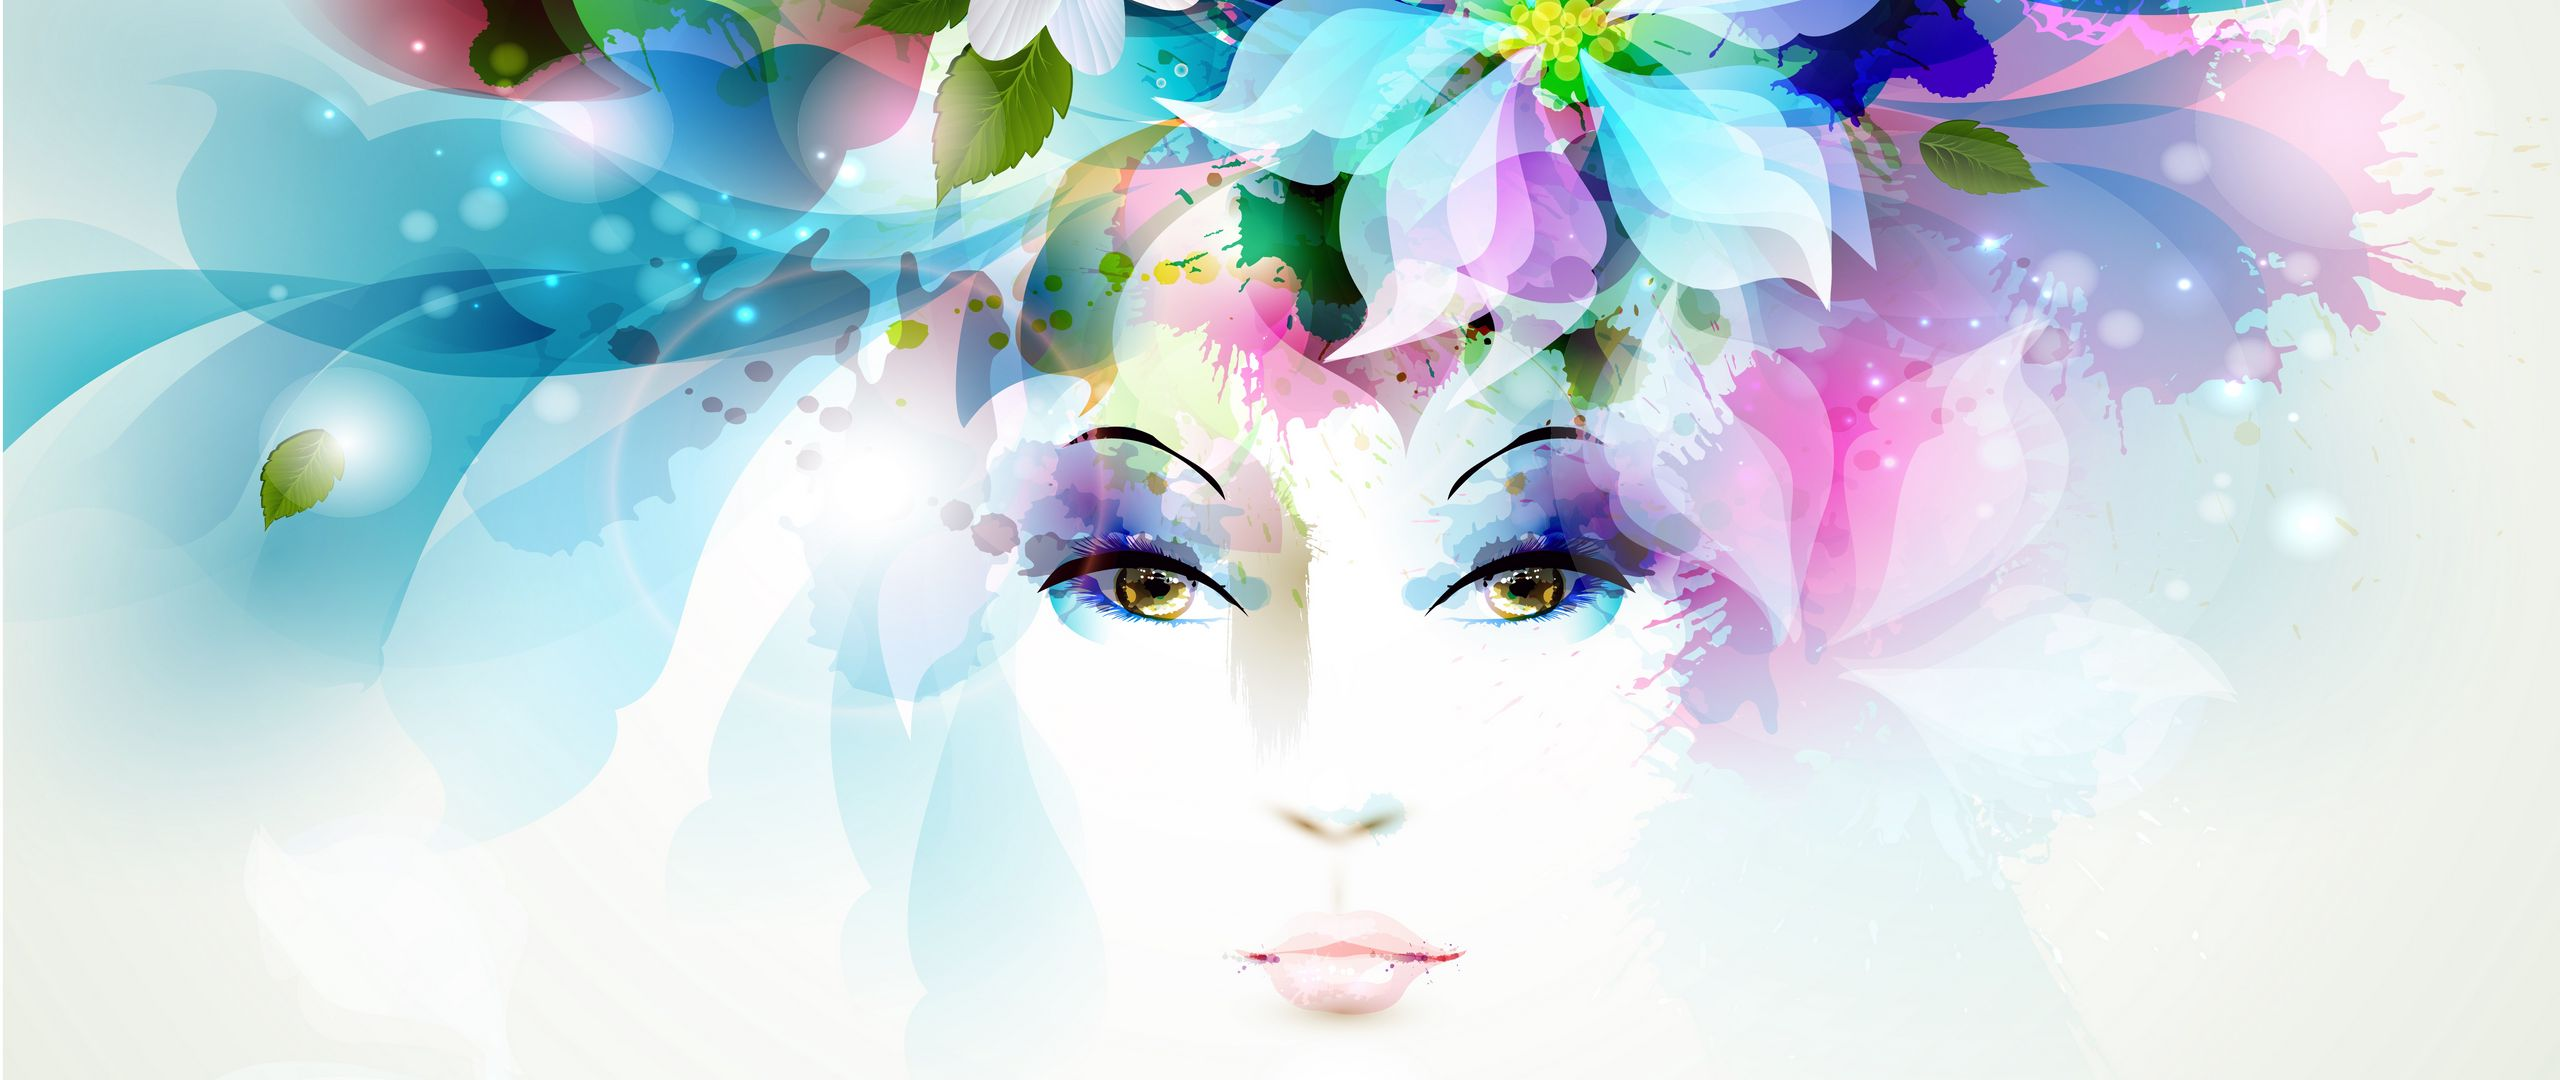 2560x1080 Wallpaper art, girl, eyes, flowers, petals, butterfly, leaves, spray